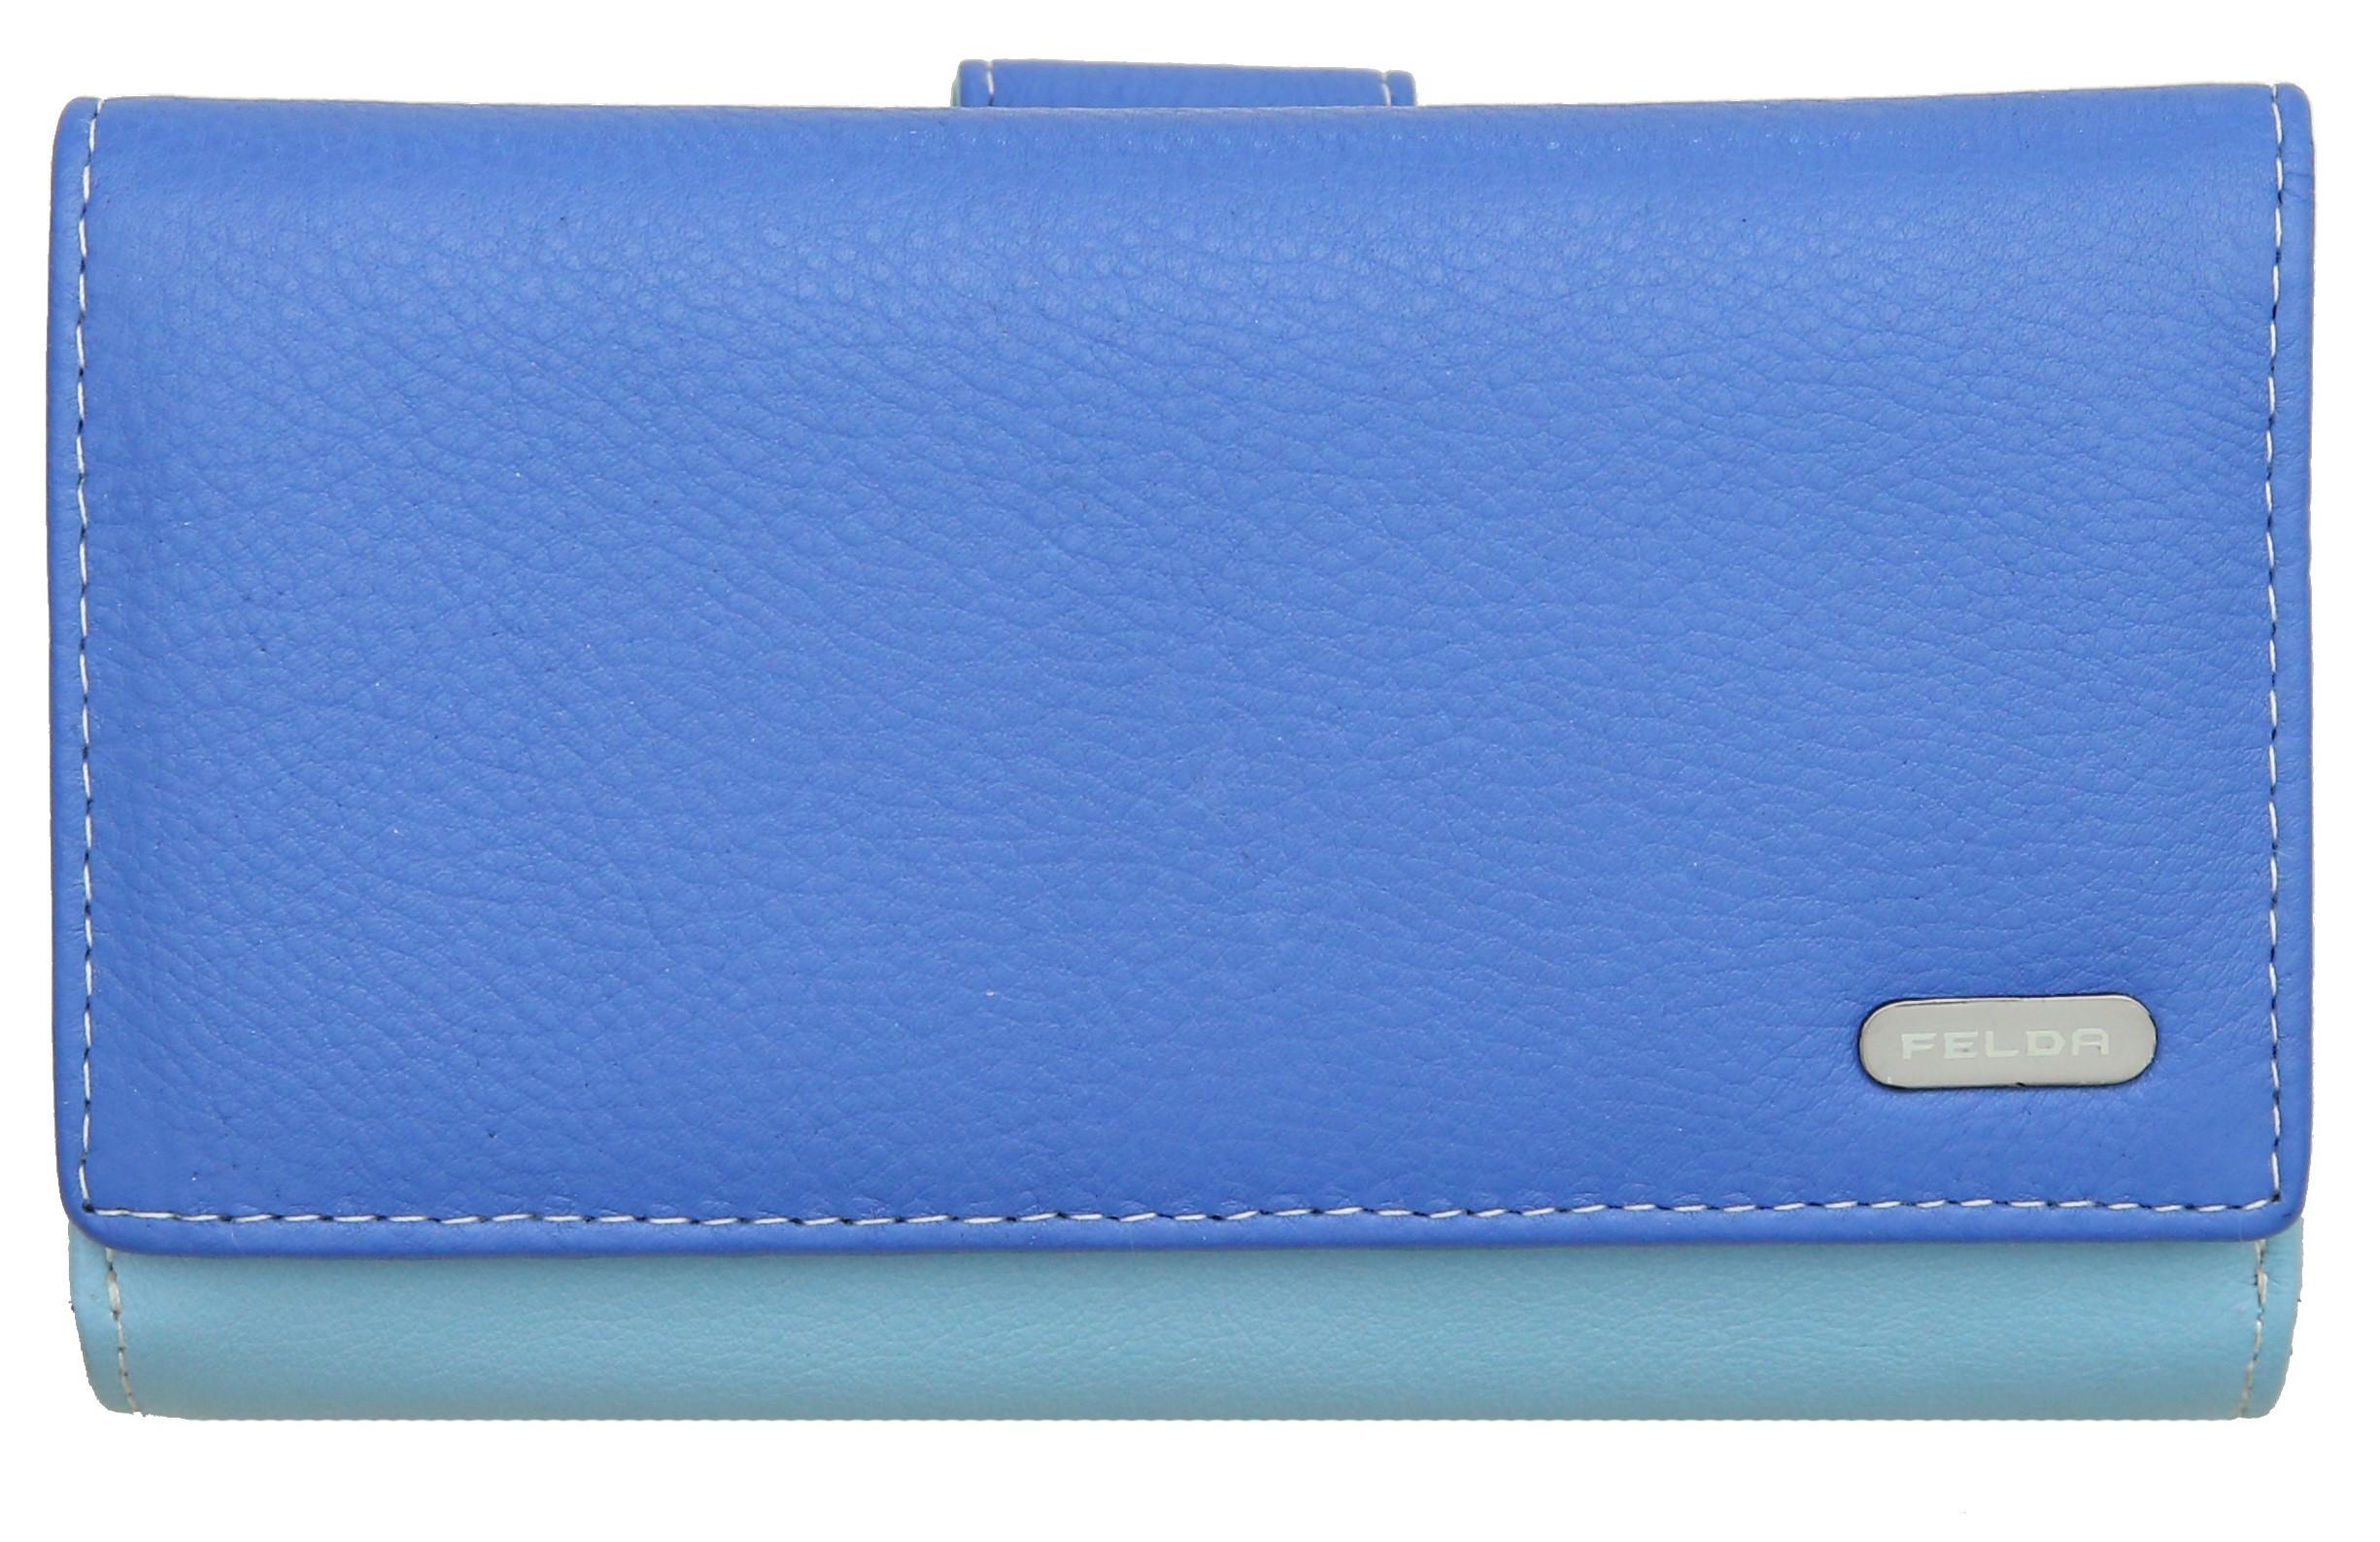 Felda-Portefeuille-pour-cartes-de-credit-cuir-souple-plusieurs-coloris miniature 12